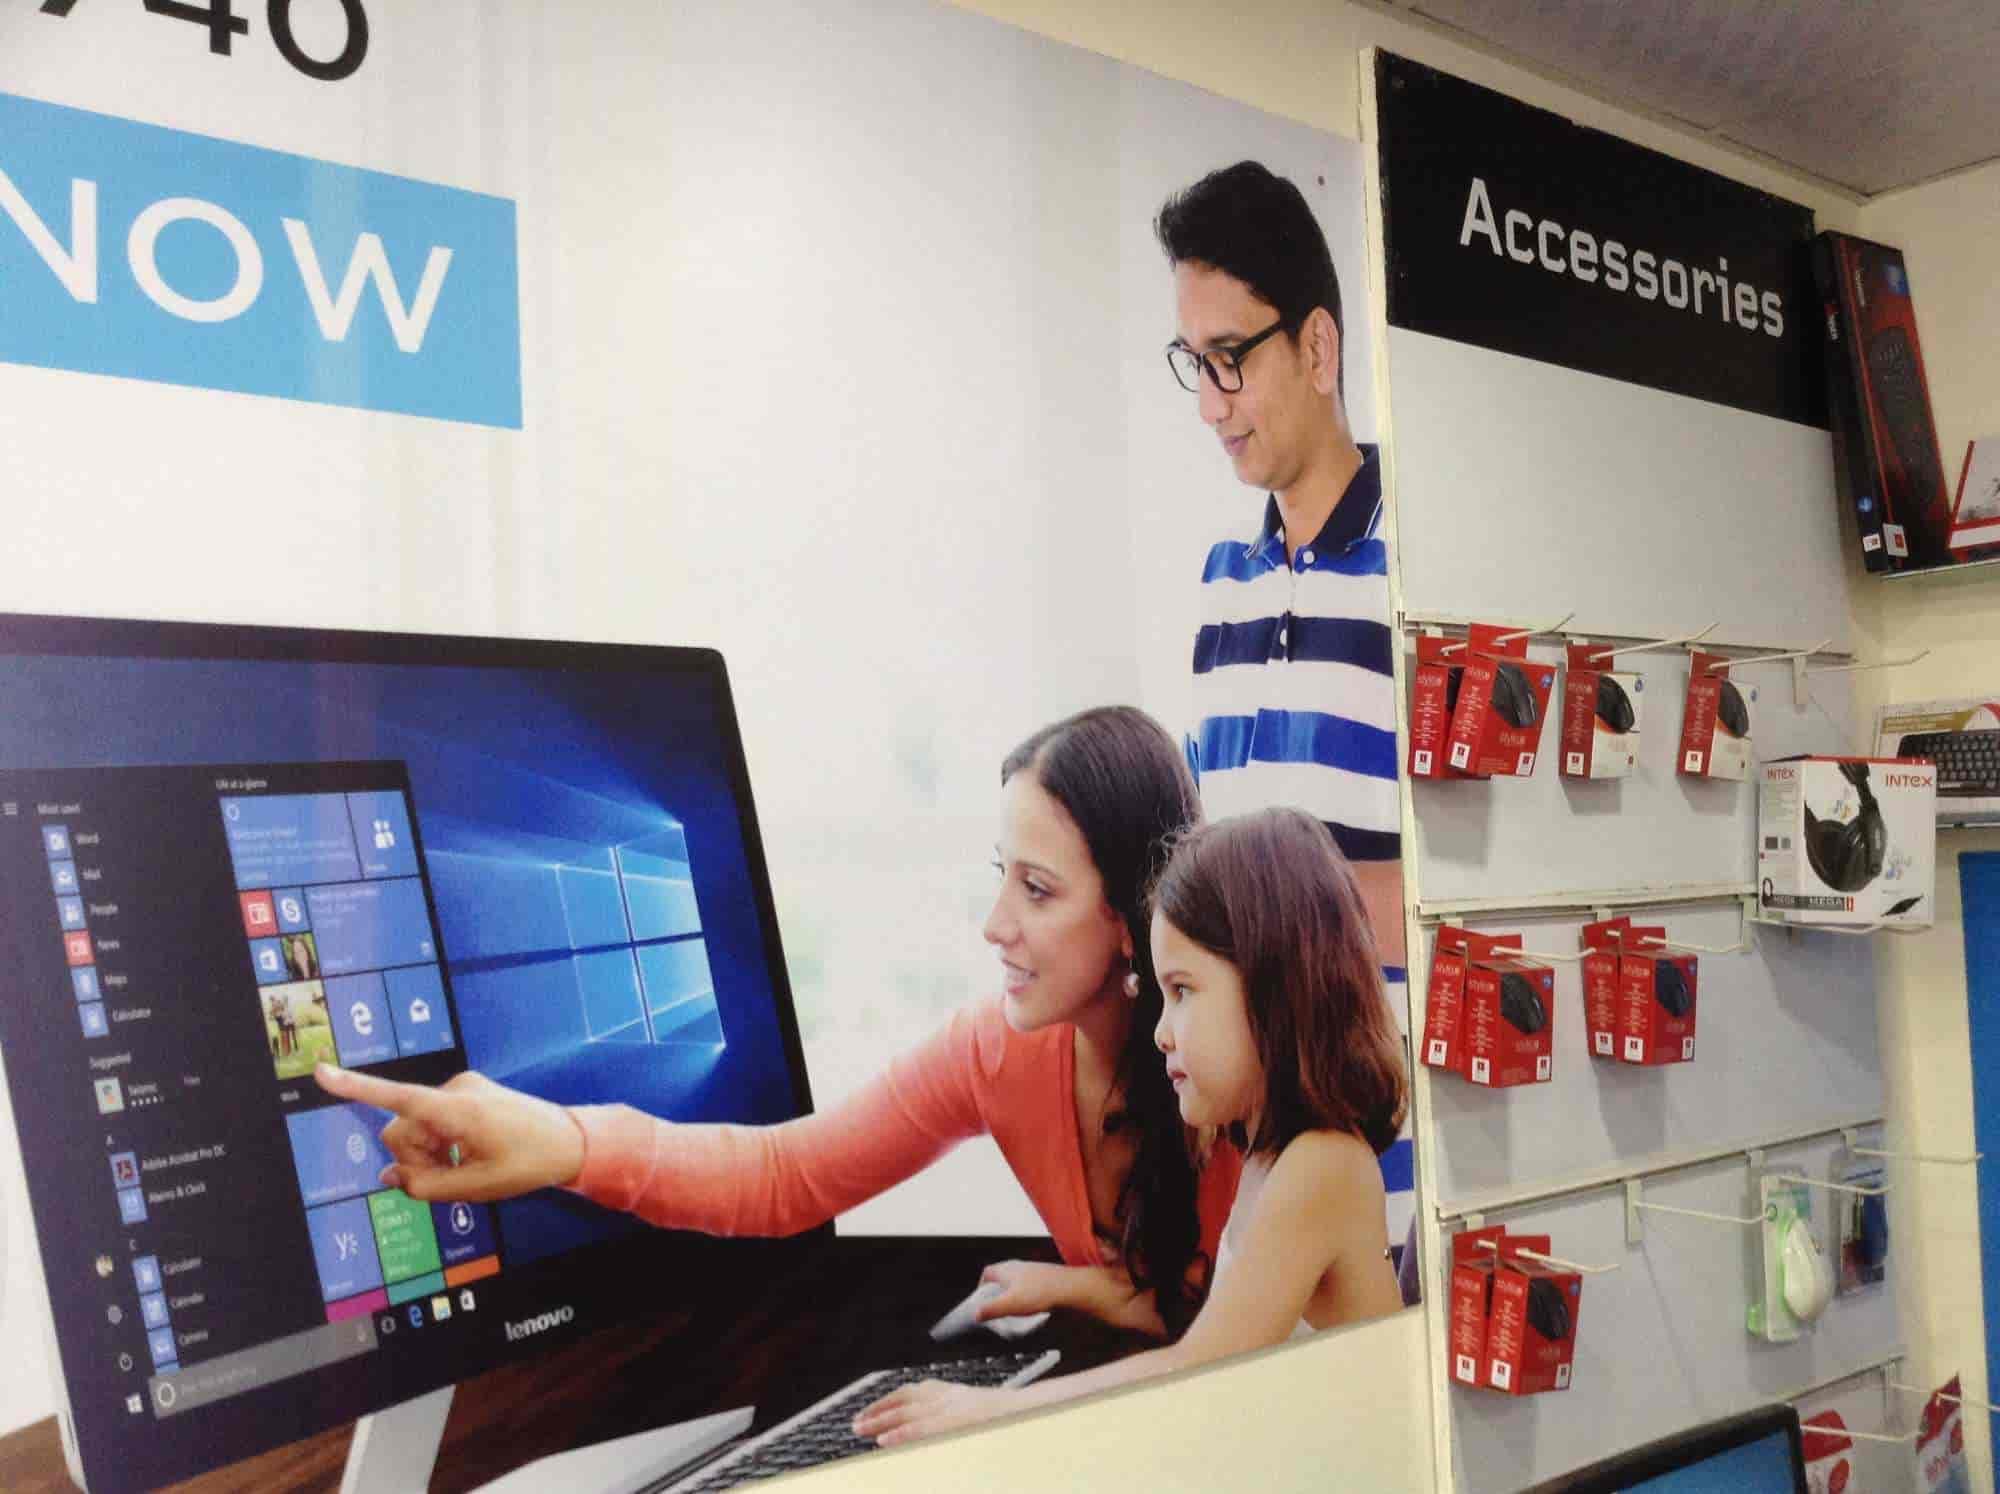 Pc World Computers, Loni Bk - Computer Dealers in Ahmednagar